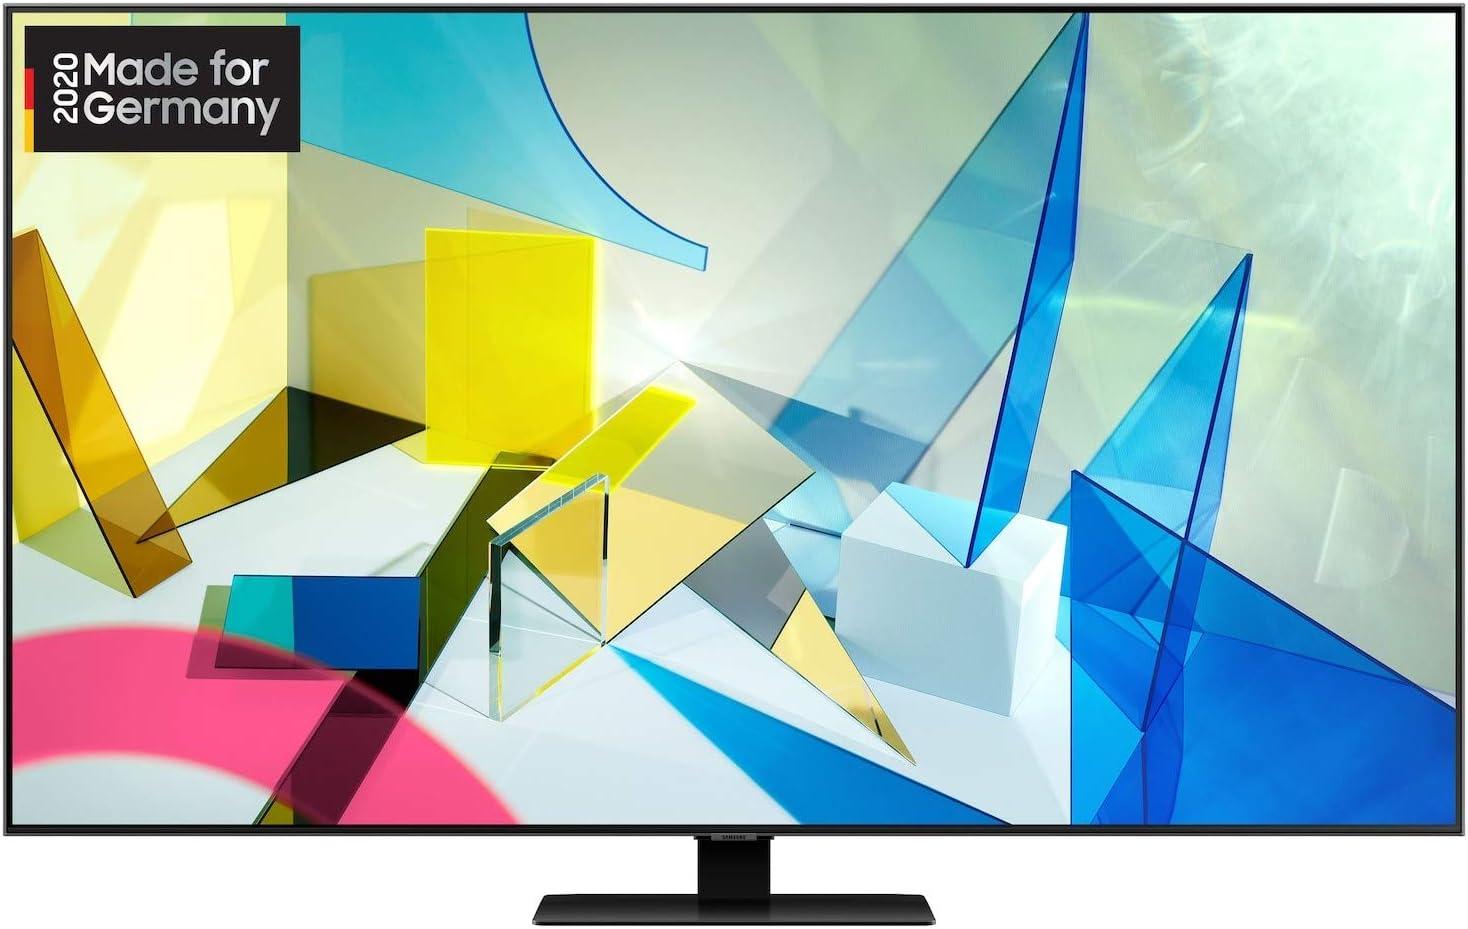 Samsung Qled 4k Q80t 189 Cm 75 Zoll Quantum Prozessor 4k Direct Full Array Quantum Hdr 1500 Modelljahr 2020 Heimkino Tv Video